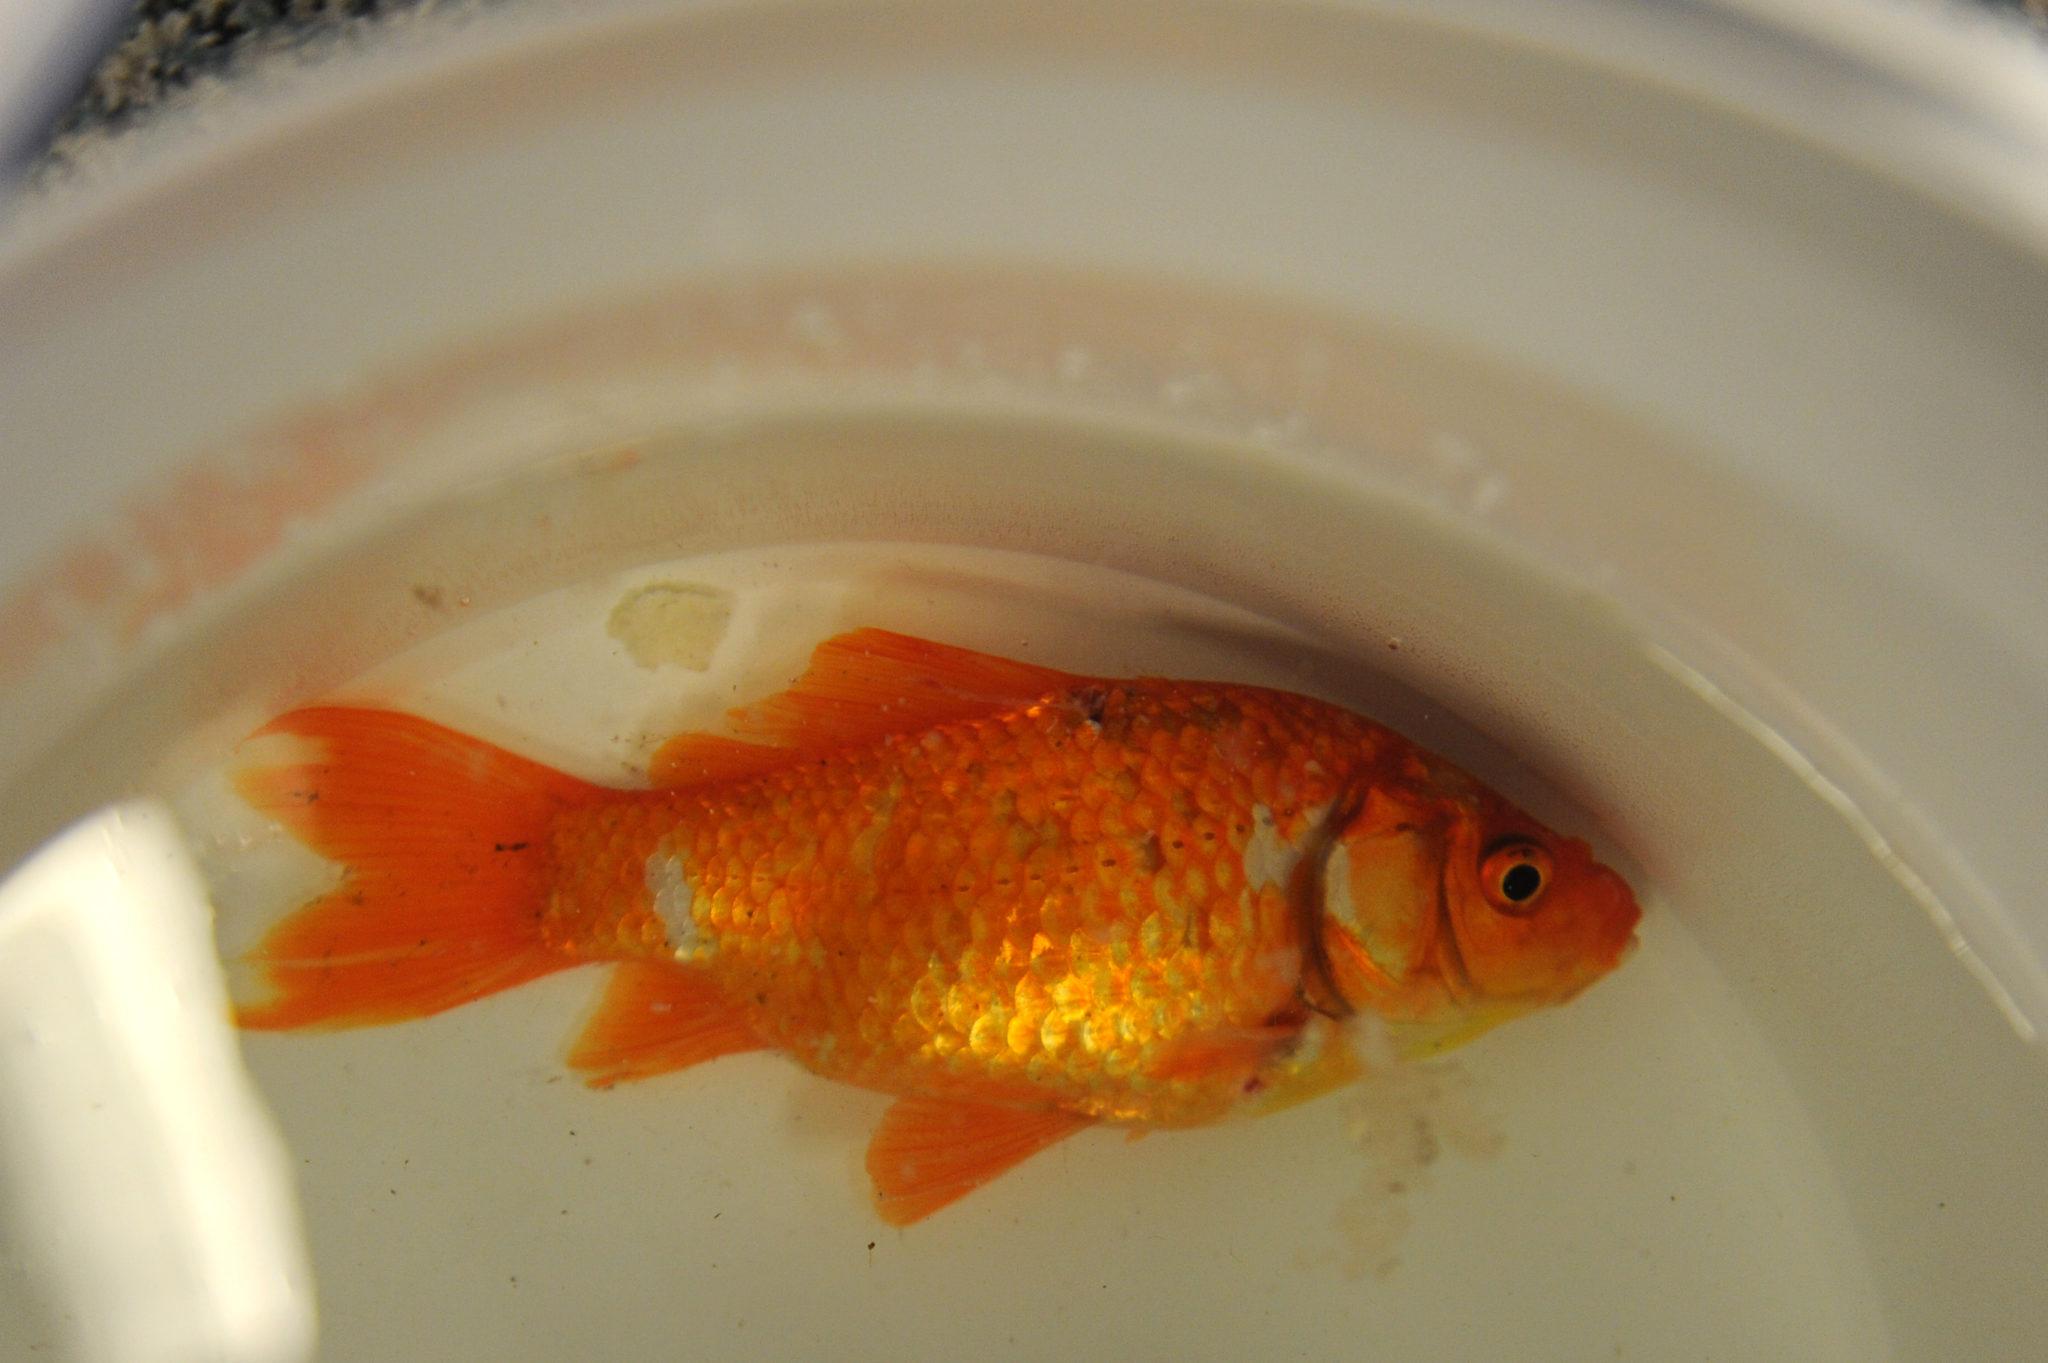 Flushing dead goldfish is safe